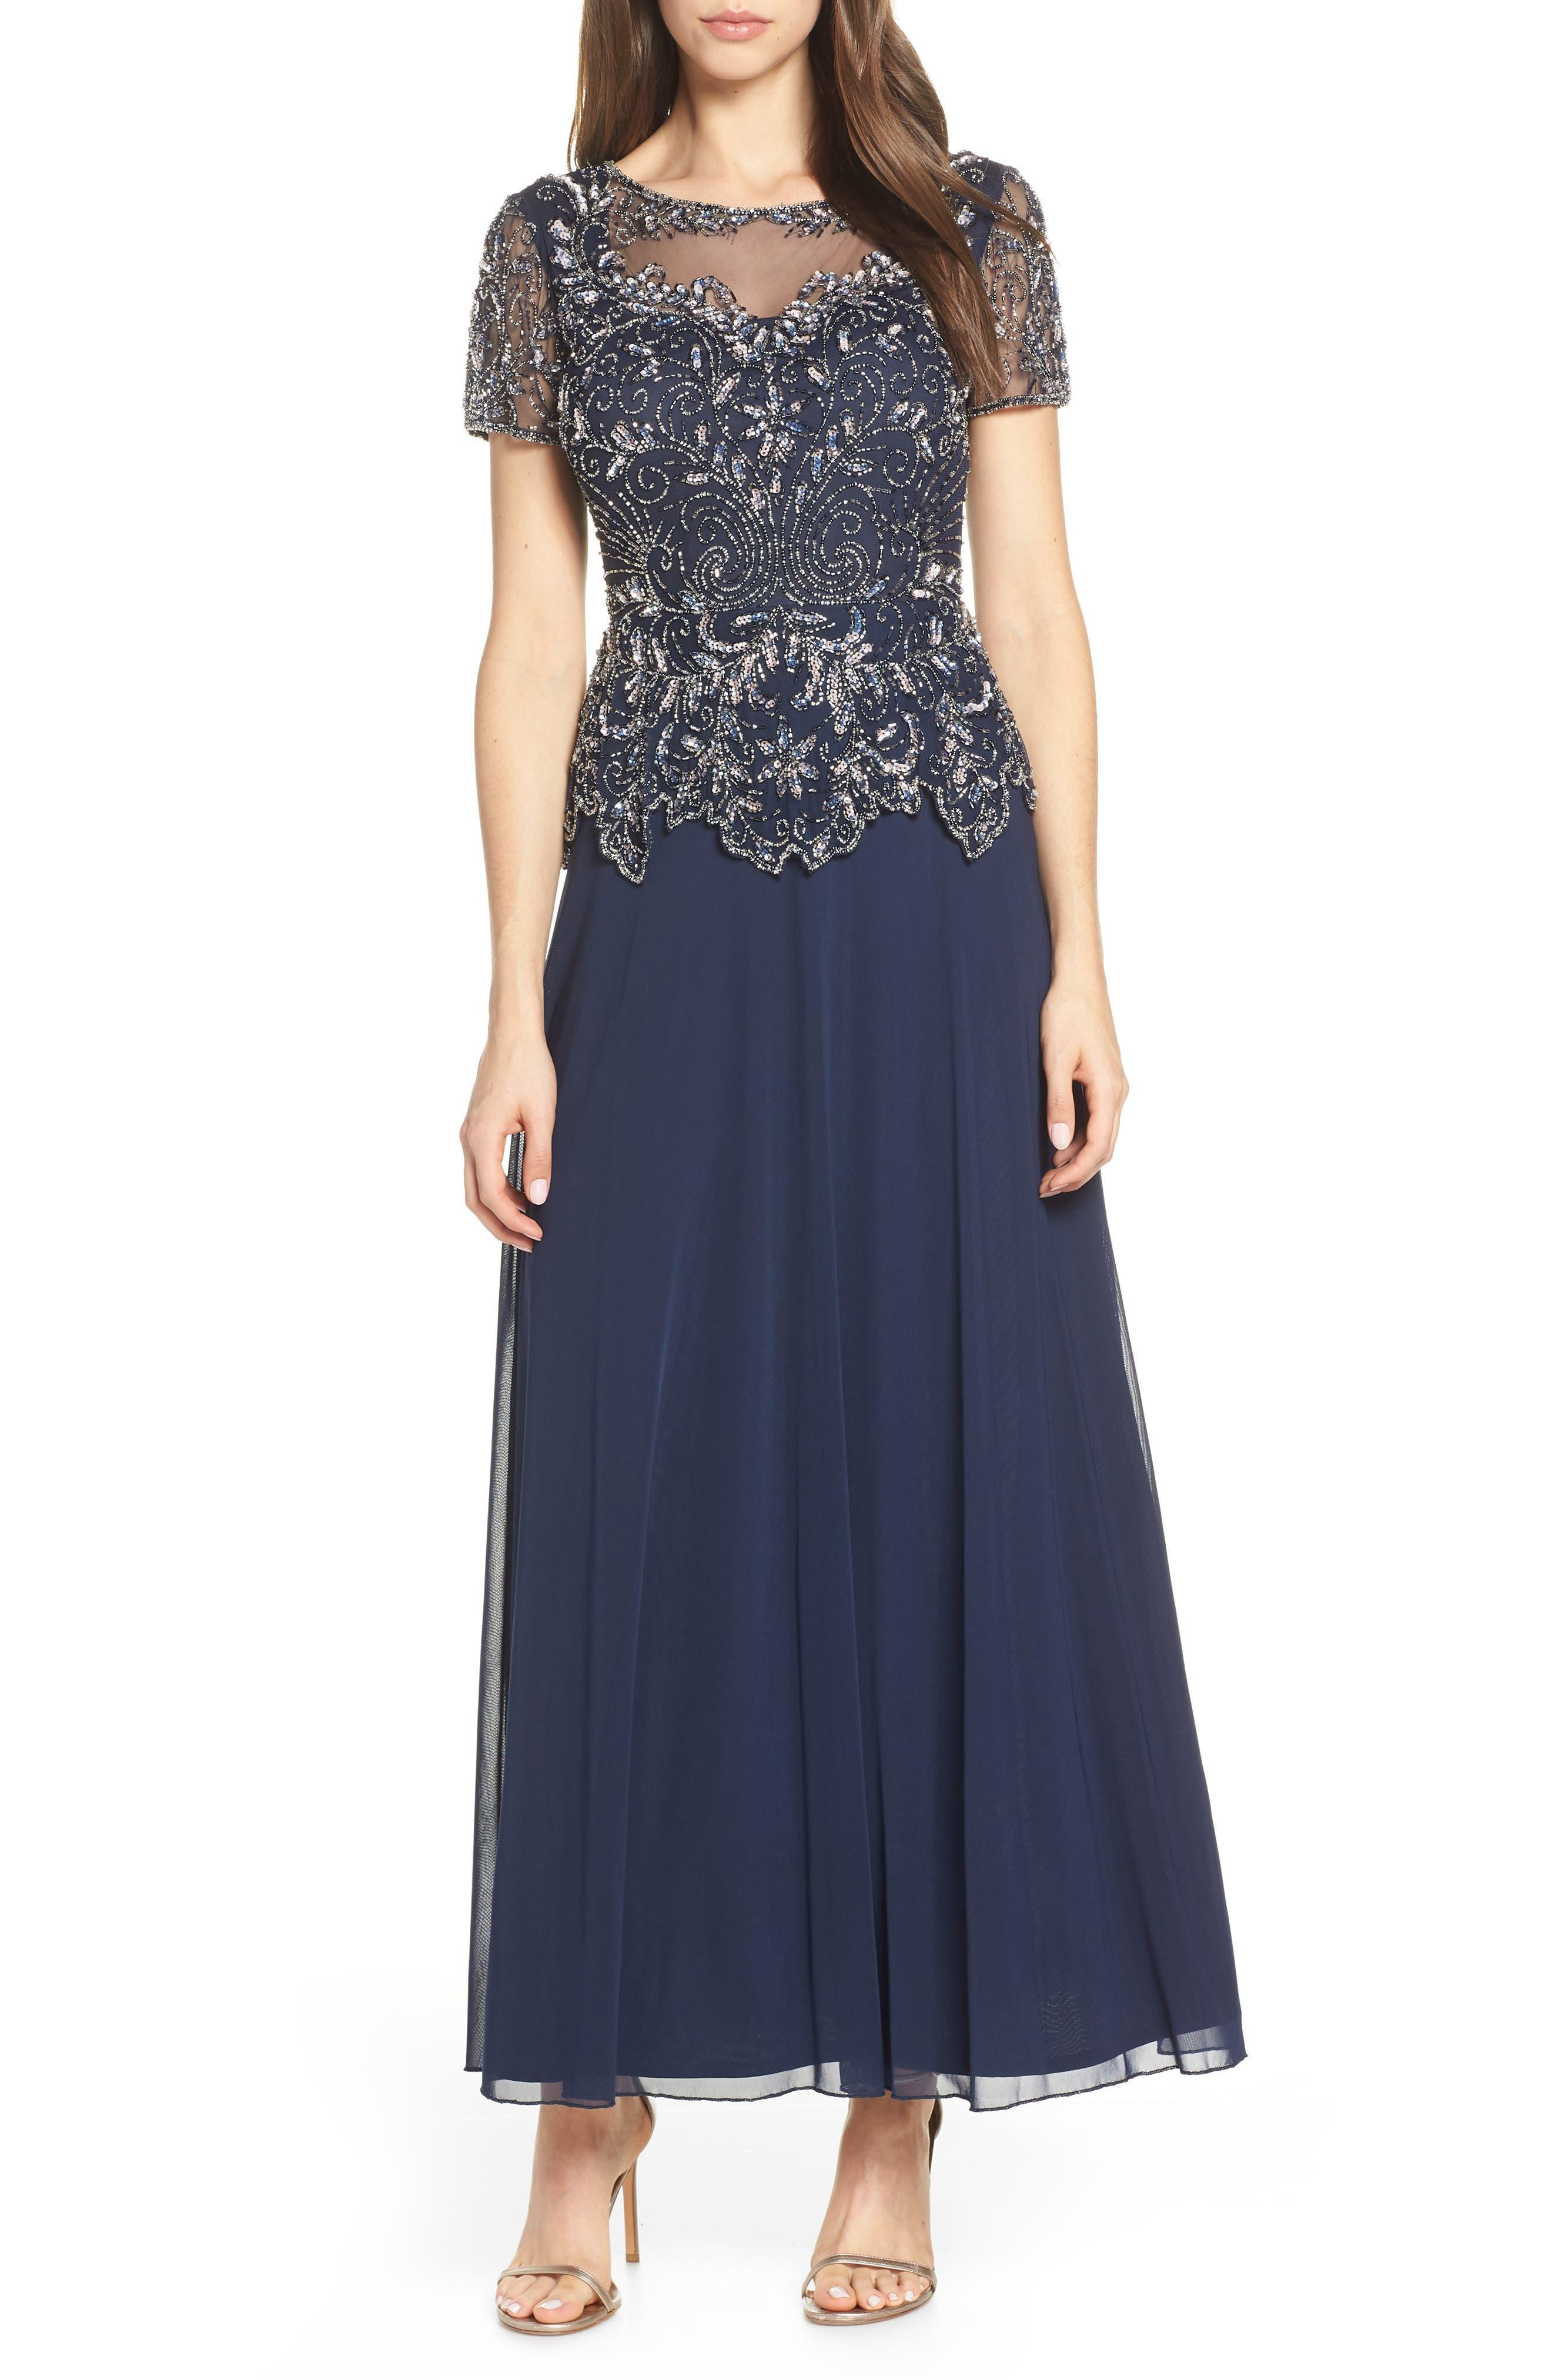 Pisarro Nights Embellished Mesh Bodice Evening Dress, Blue